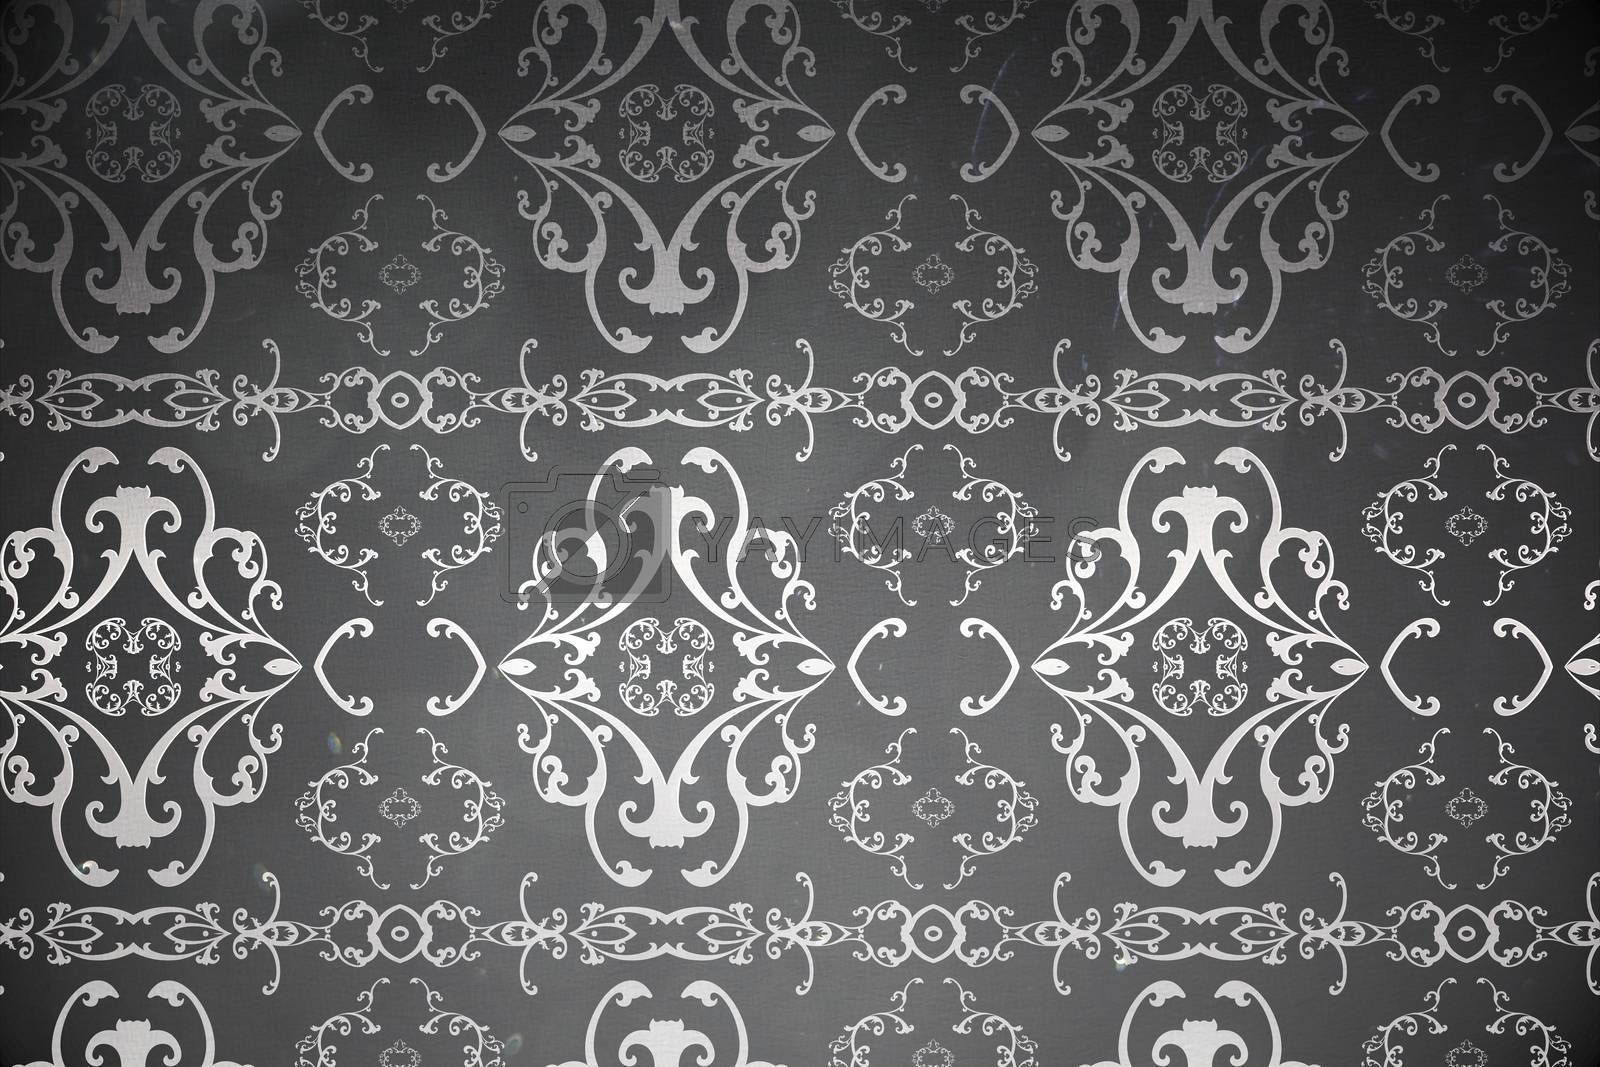 Royalty free image of Elegant patterned wallpaper in grey by Wavebreakmedia